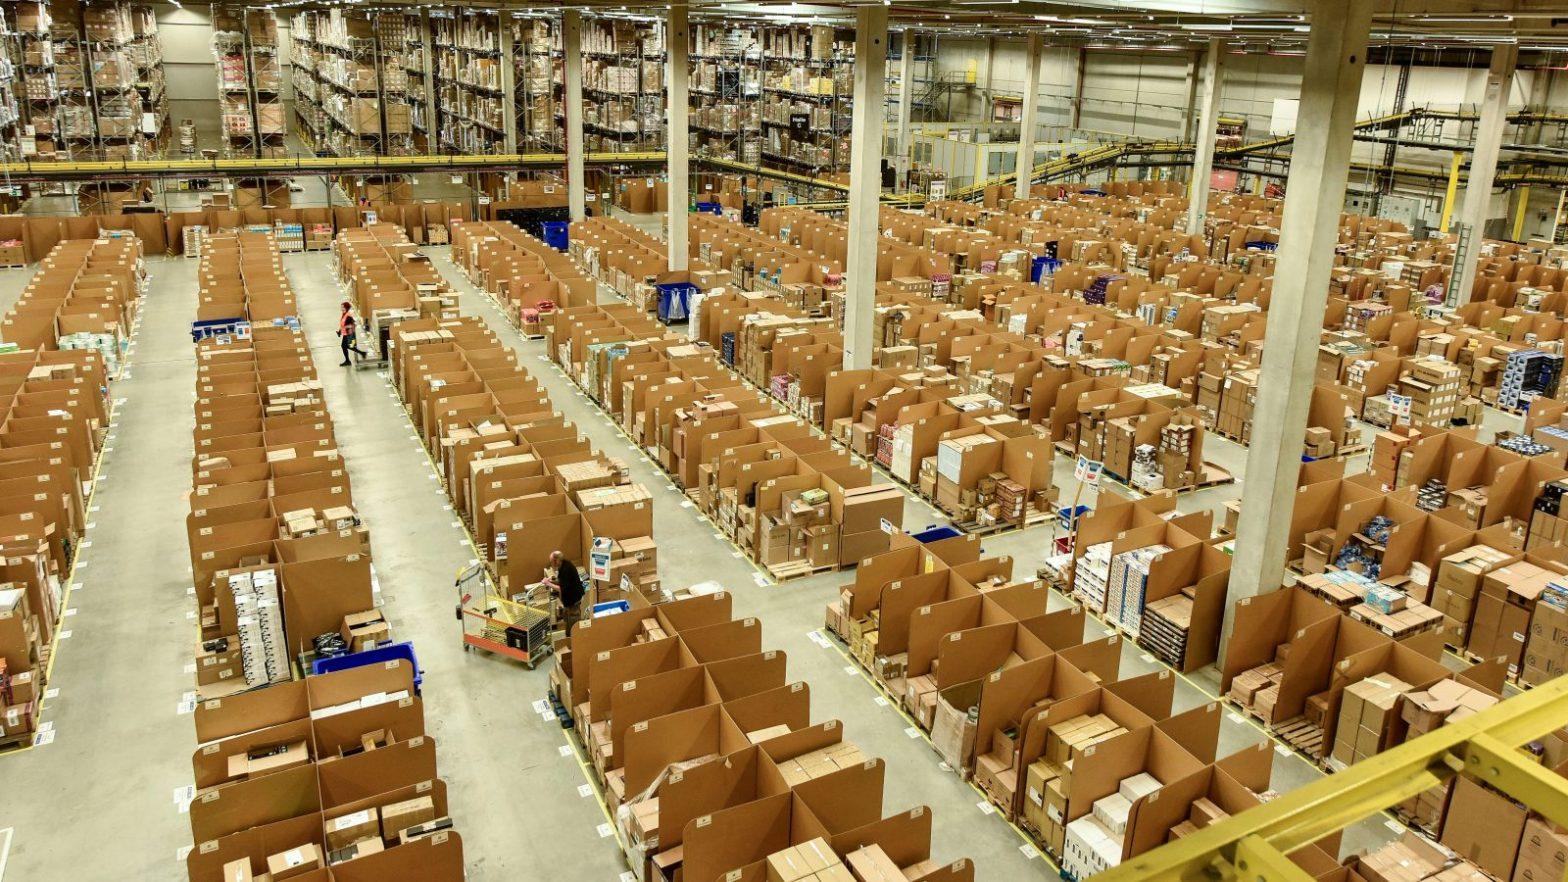 Report: Amazon Facing Antitrust Probe in the EU Over Its Use of Marketplace Merchant Data – Gizmodo